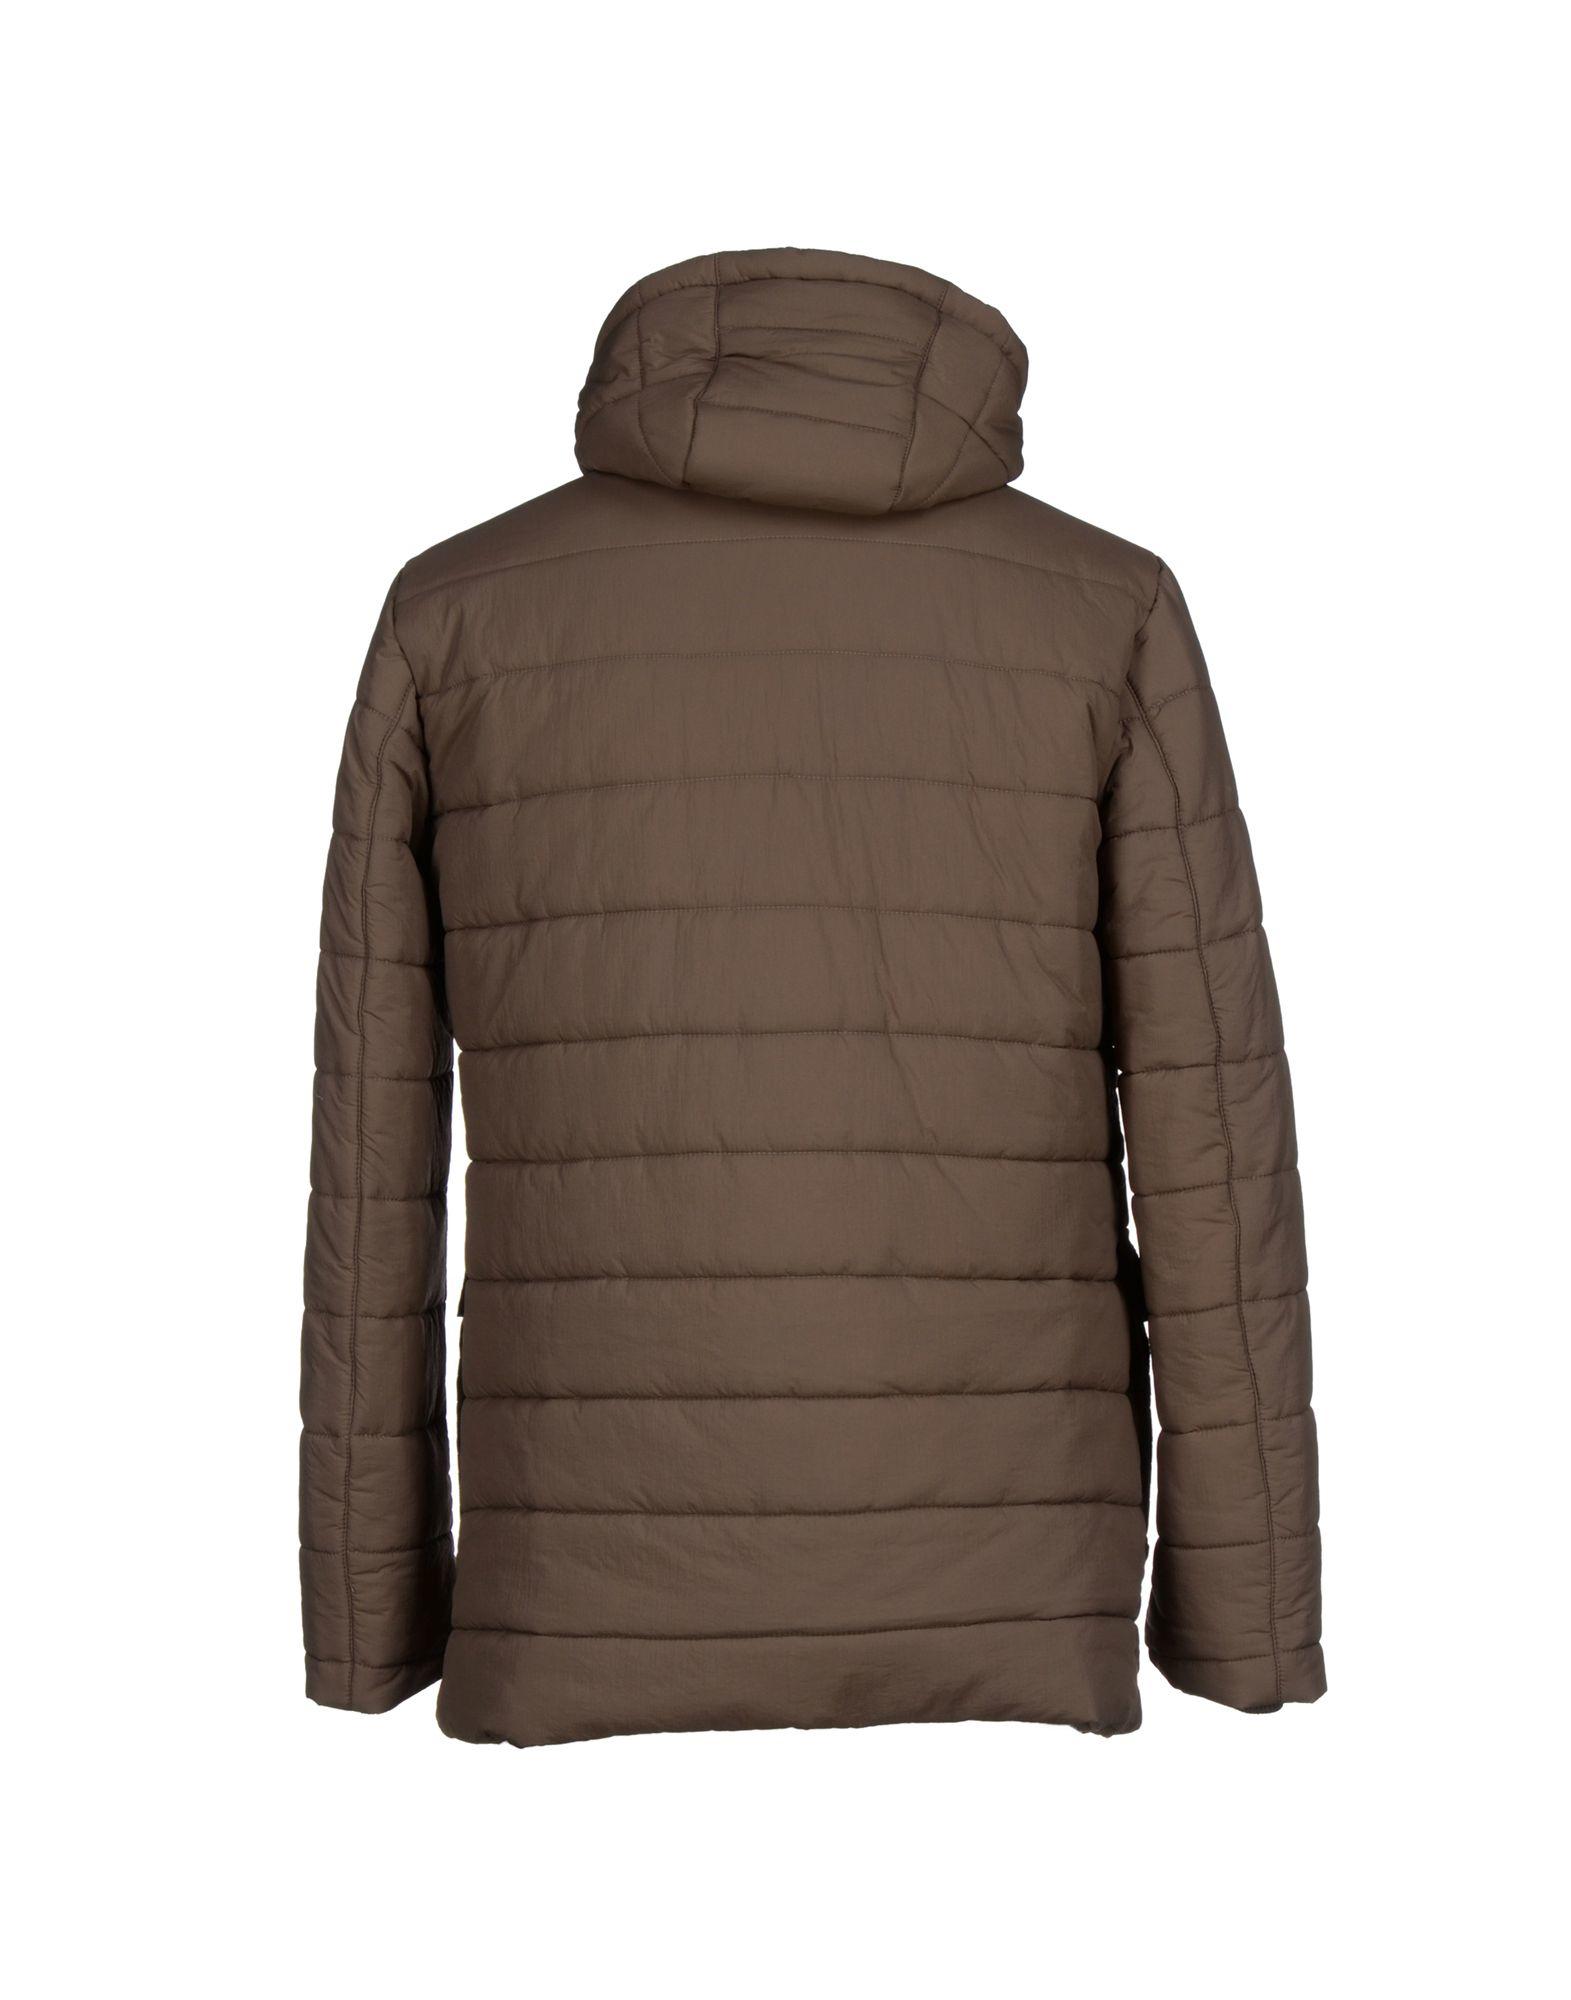 Aquarama Synthetic Jacket in Khaki (Brown) for Men